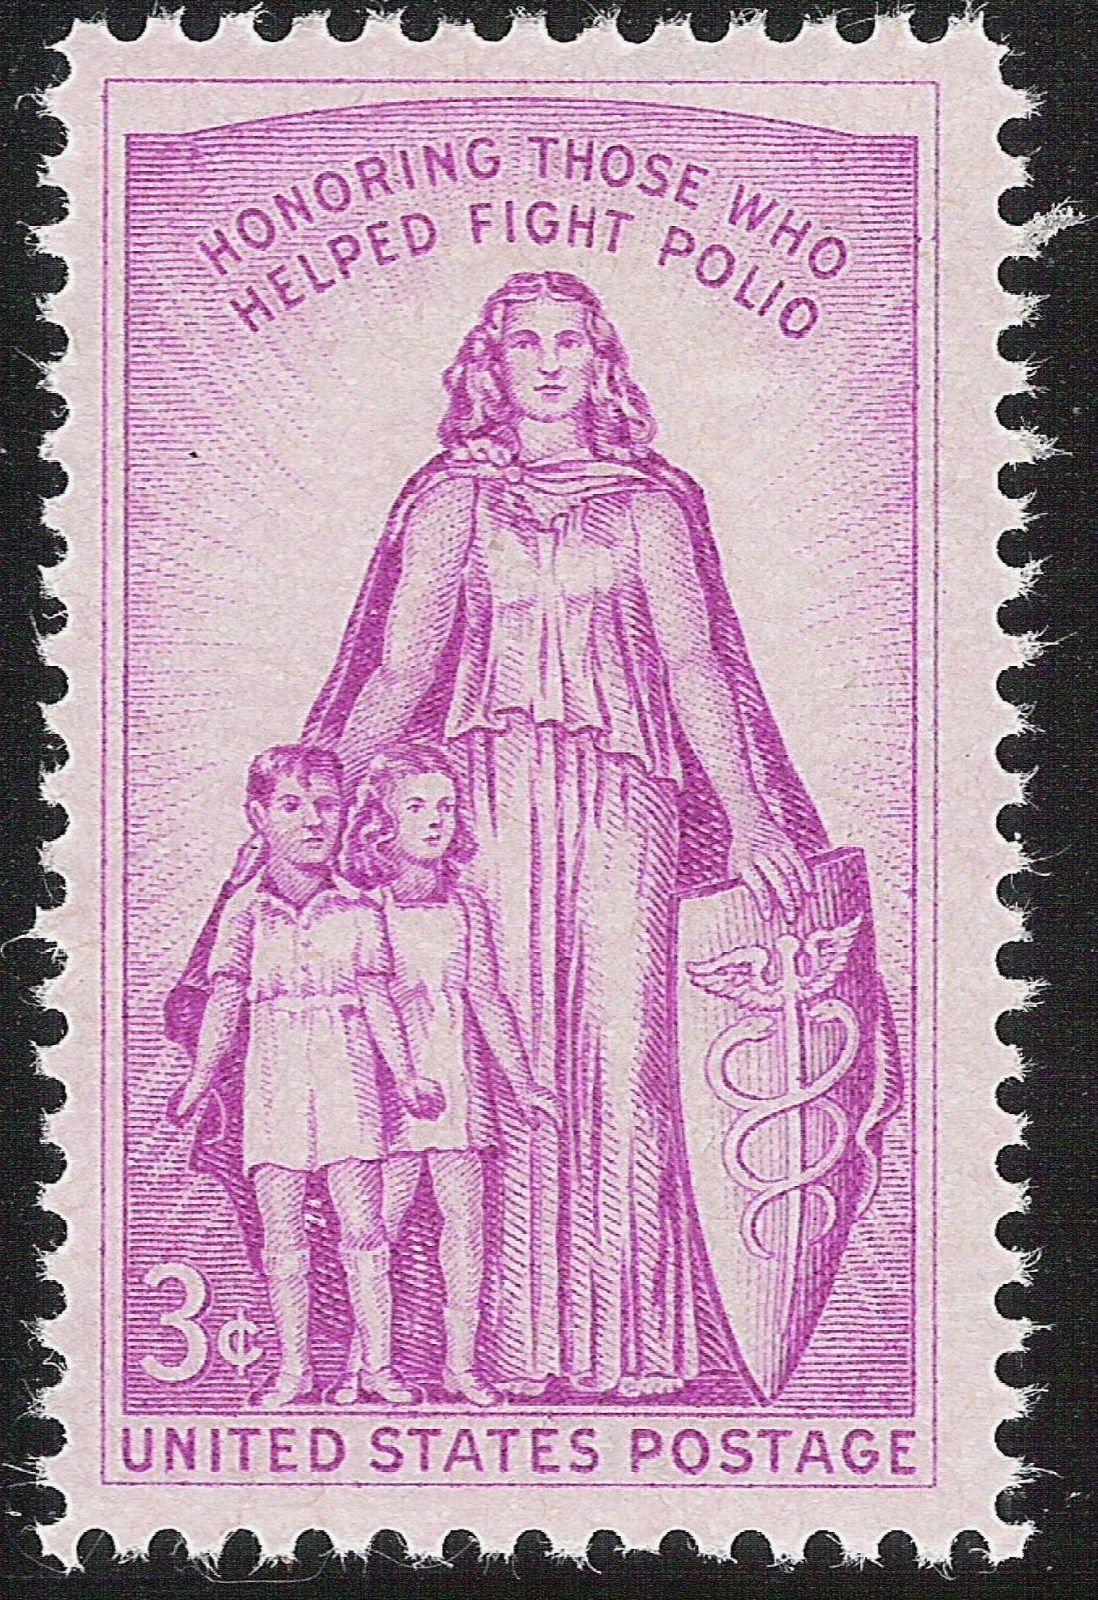 Scott 1087 Honoring Those Who Fight Polio Unused US Stamp 3c